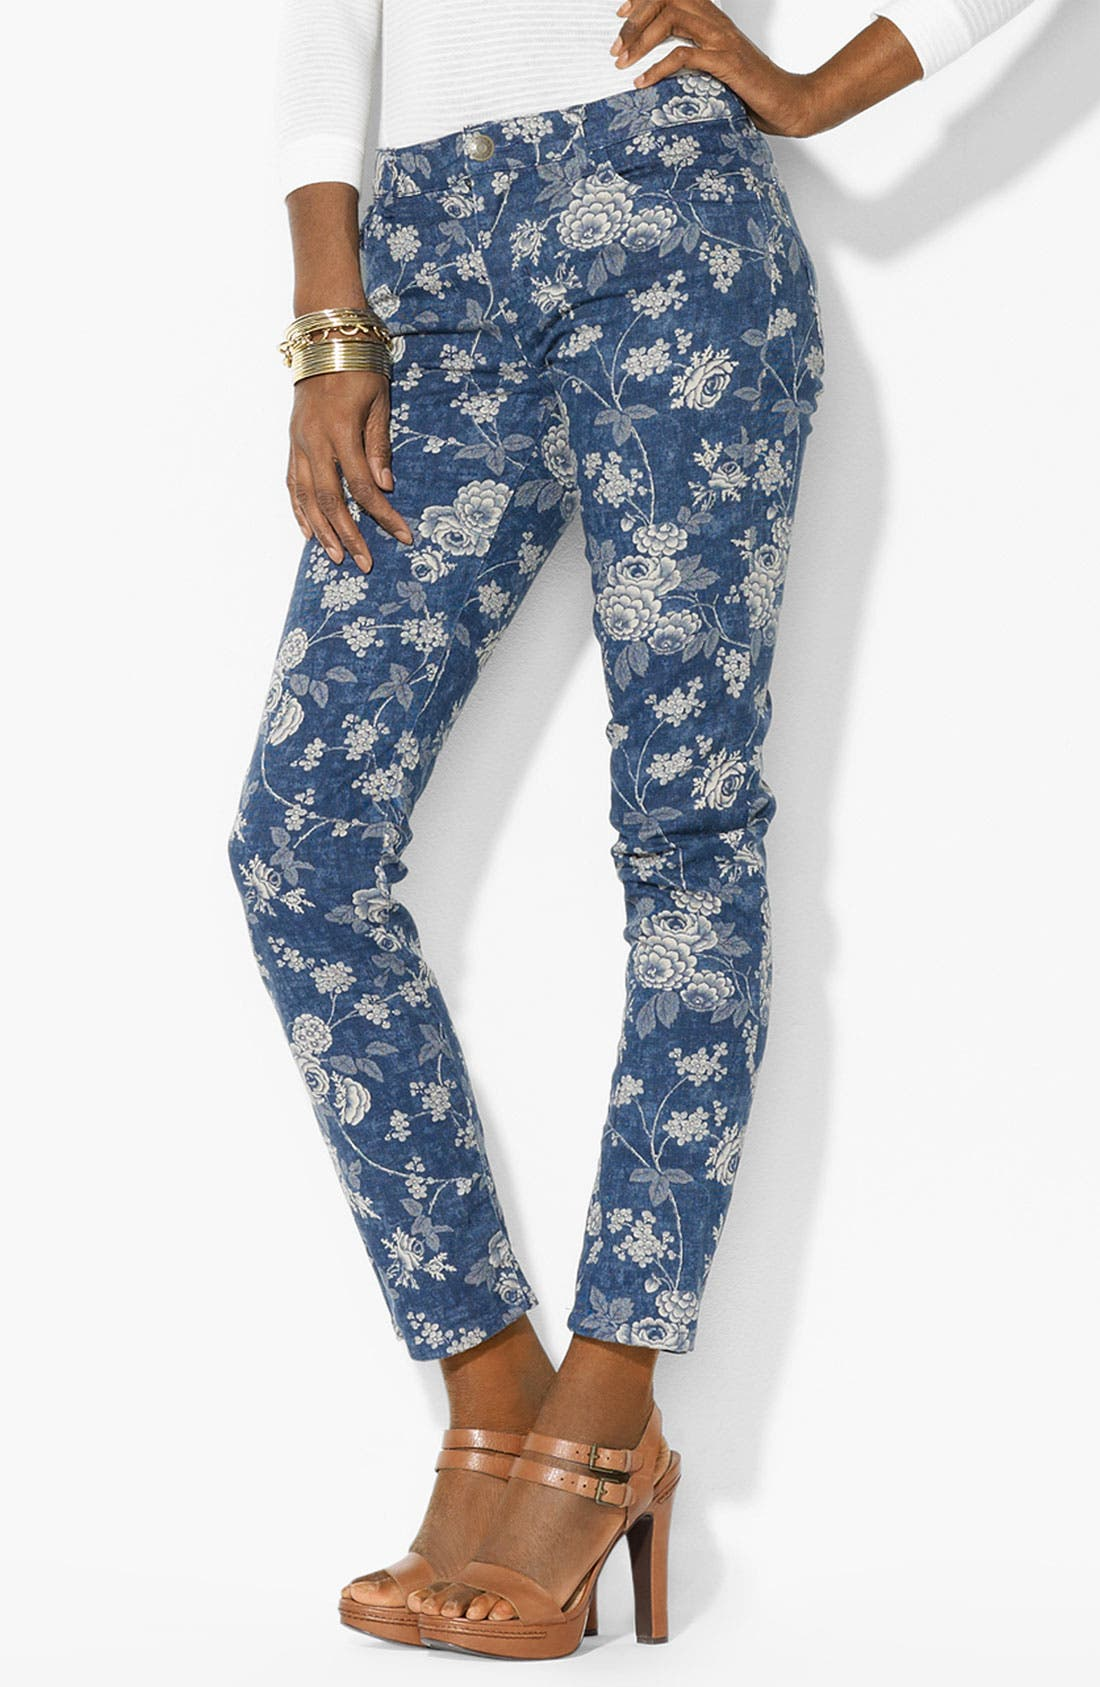 Main Image - Lauren Ralph Lauren Print Straight Leg Ankle Pants (Petite) (Online Only)